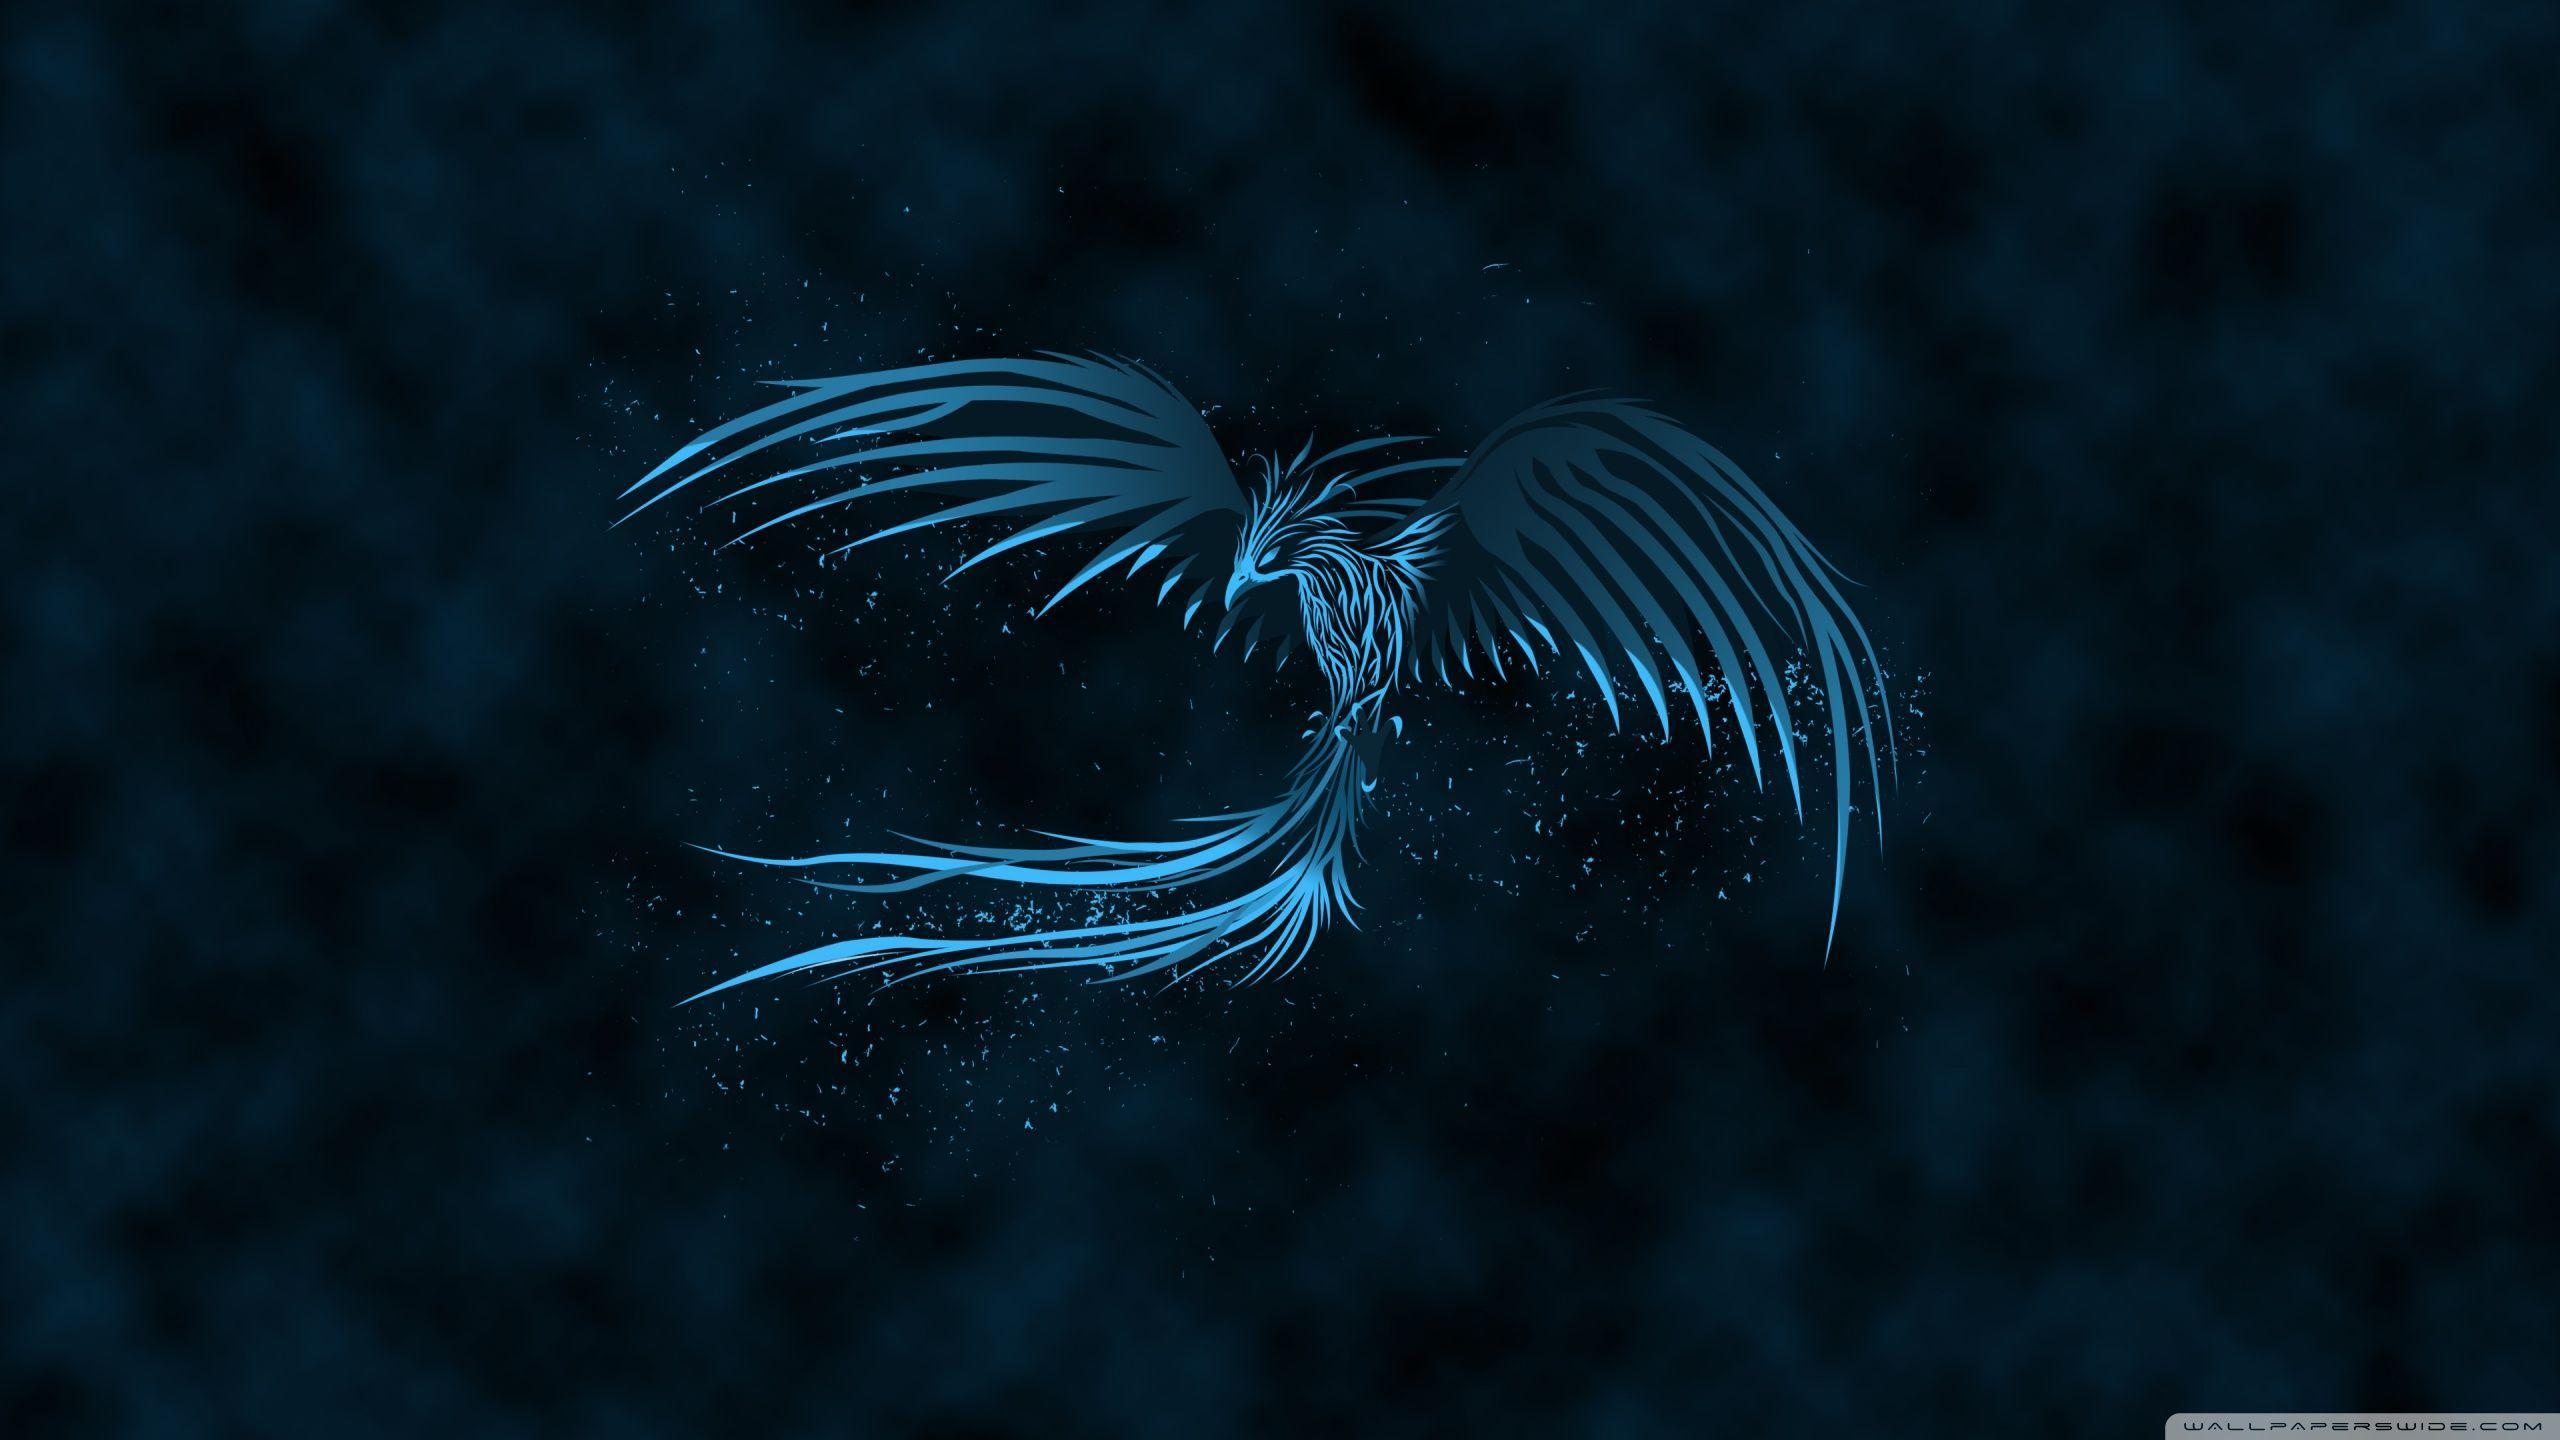 Hd phoenix wallpapers top free hd phoenix backgrounds wallpaperaccess - Fenix bird hd images ...